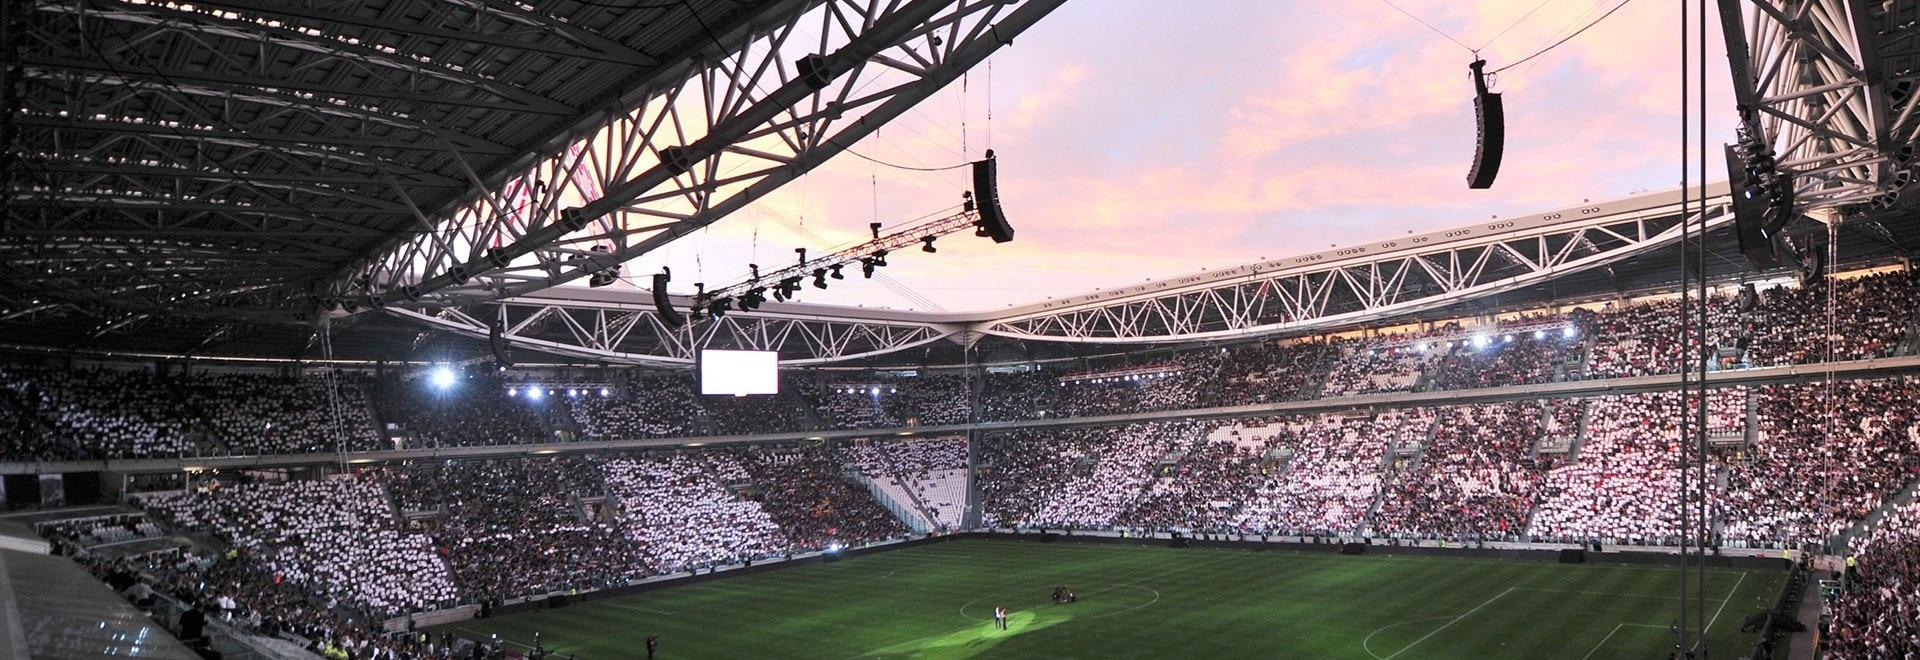 Juve-Milan da Ancelotti ad Allegri